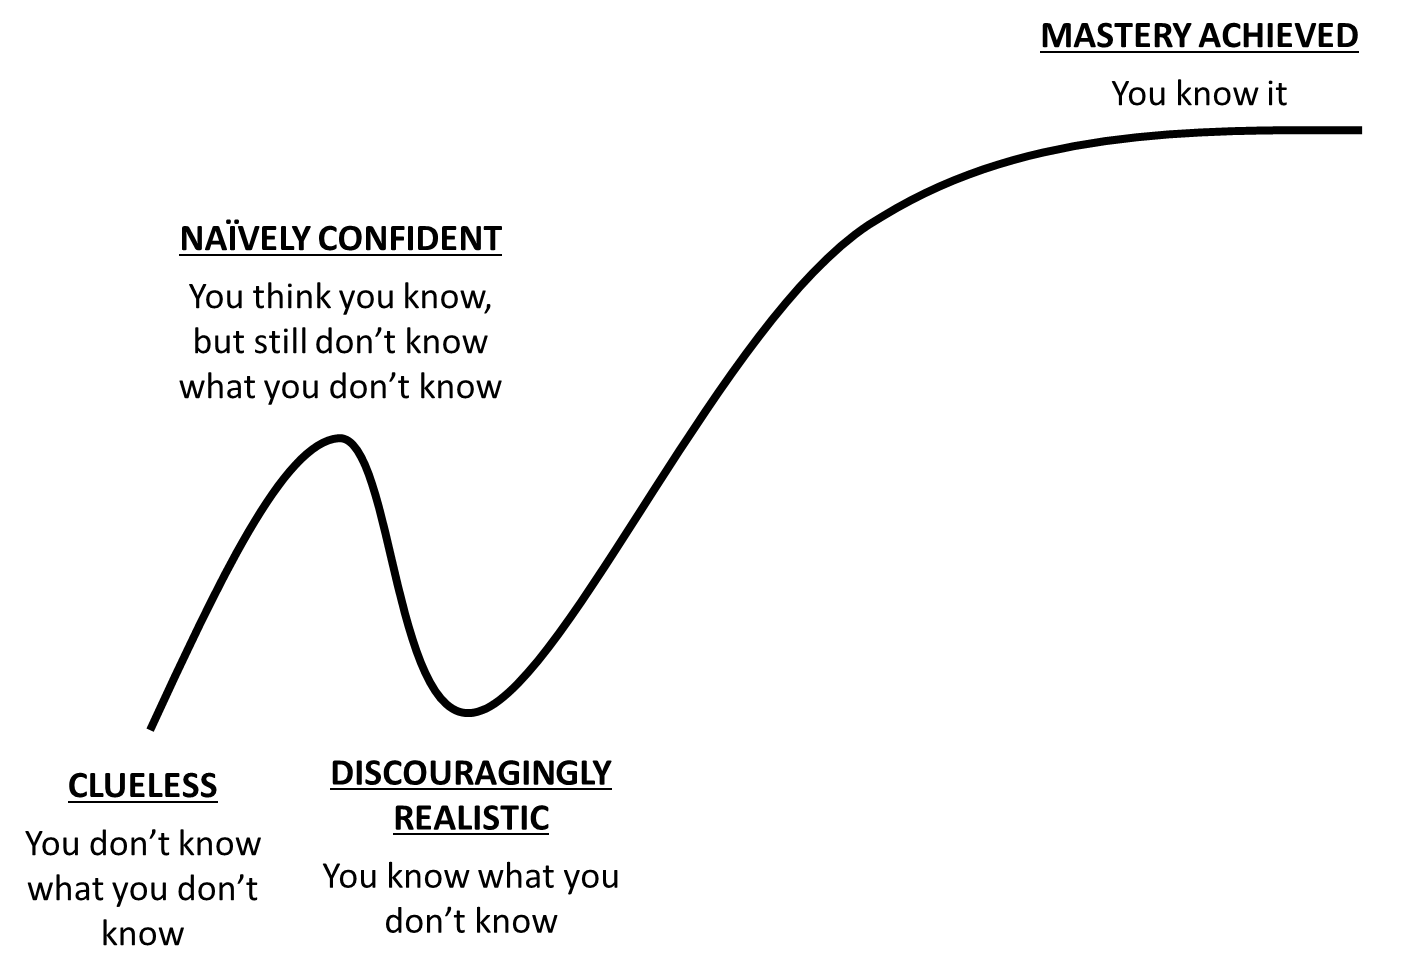 http://drvidyahattangadi.com/wp-content/uploads/2016/02/curve2.png